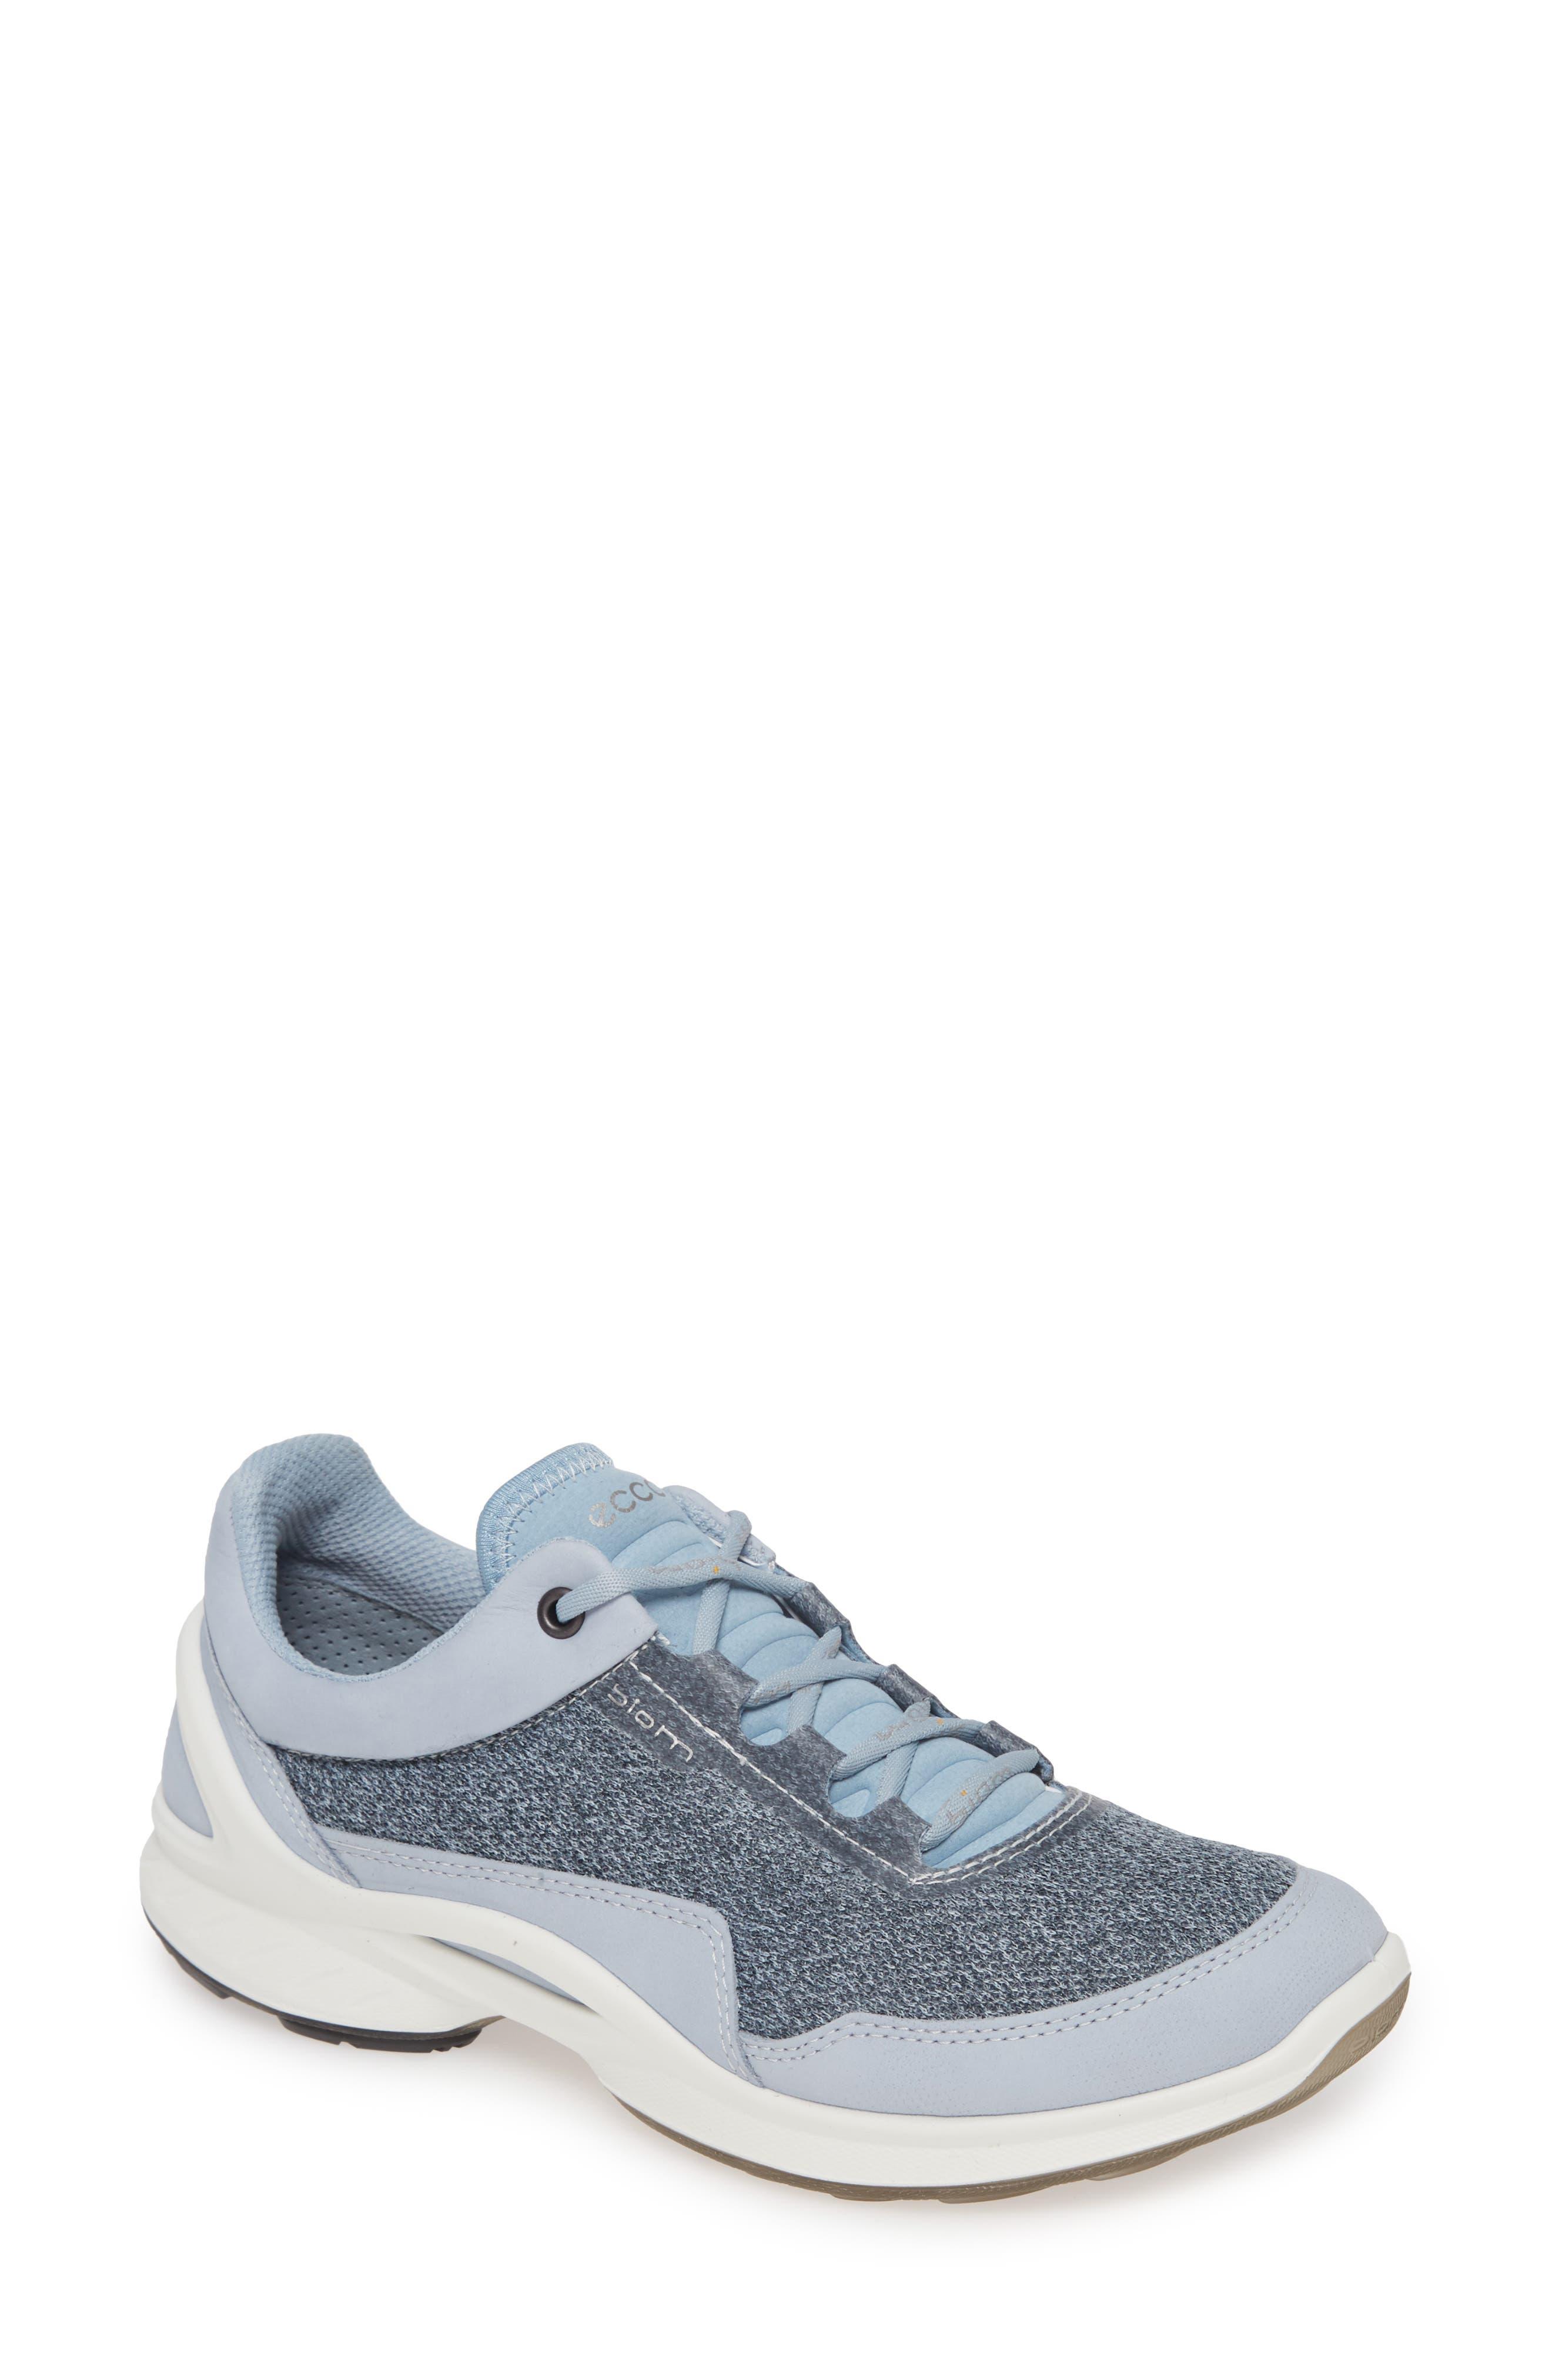 Women's Ecco Biom Fjuel Sneaker